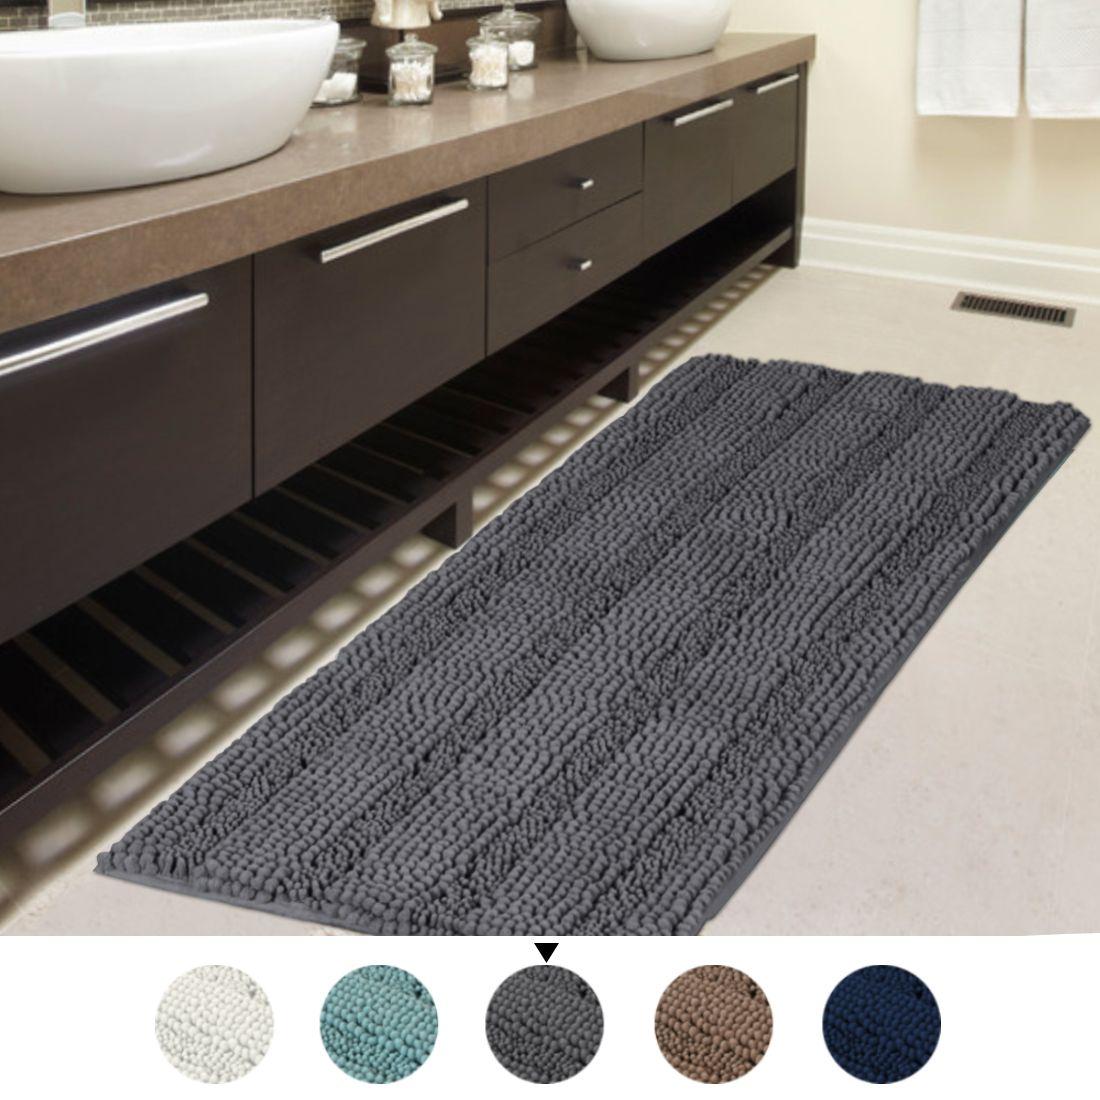 Soft Shaggy Non Slip Absorbent Bath Mat Bathroom Shower Rugs Carpet Long Rug